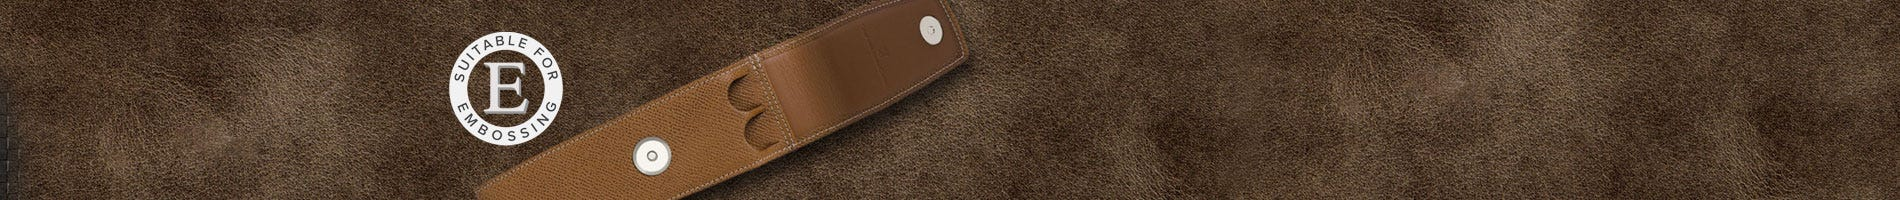 Black leather single pen case